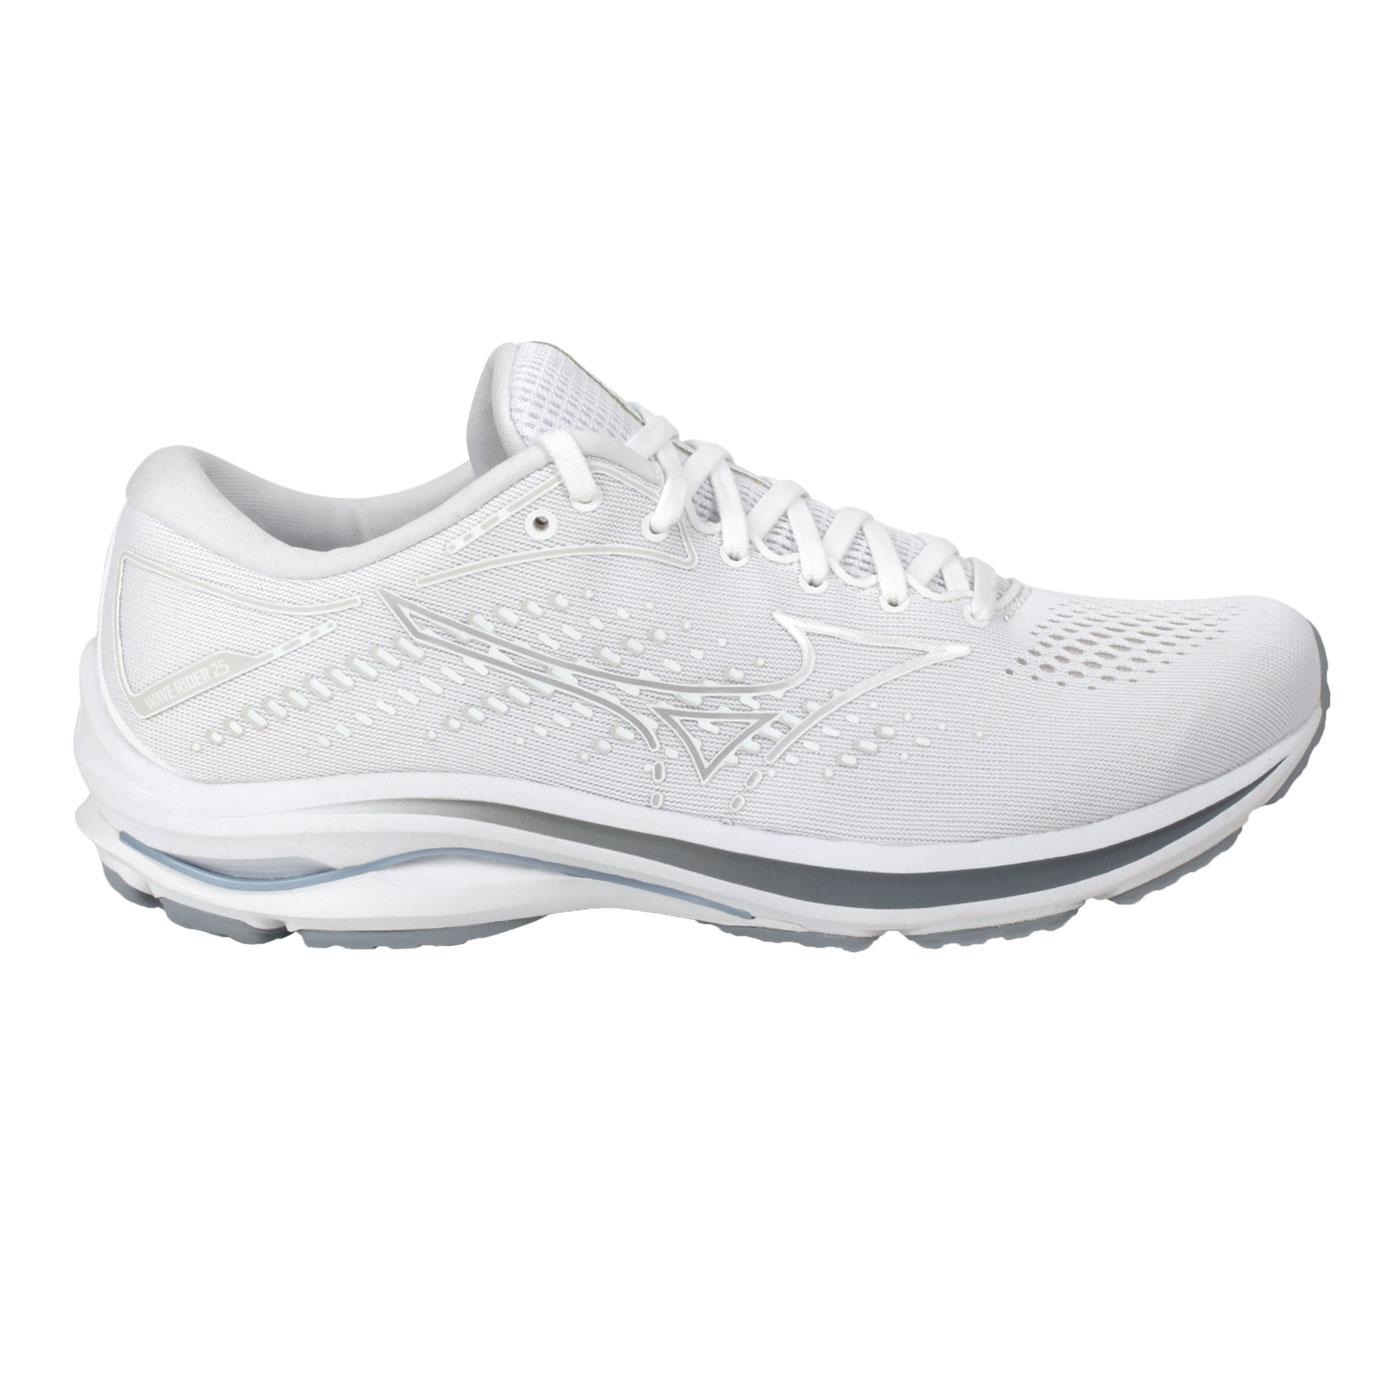 MIZUNO 男款慢跑鞋-4E  @WAVE RIDER 25 SW@J1GC210496 - 白灰藍